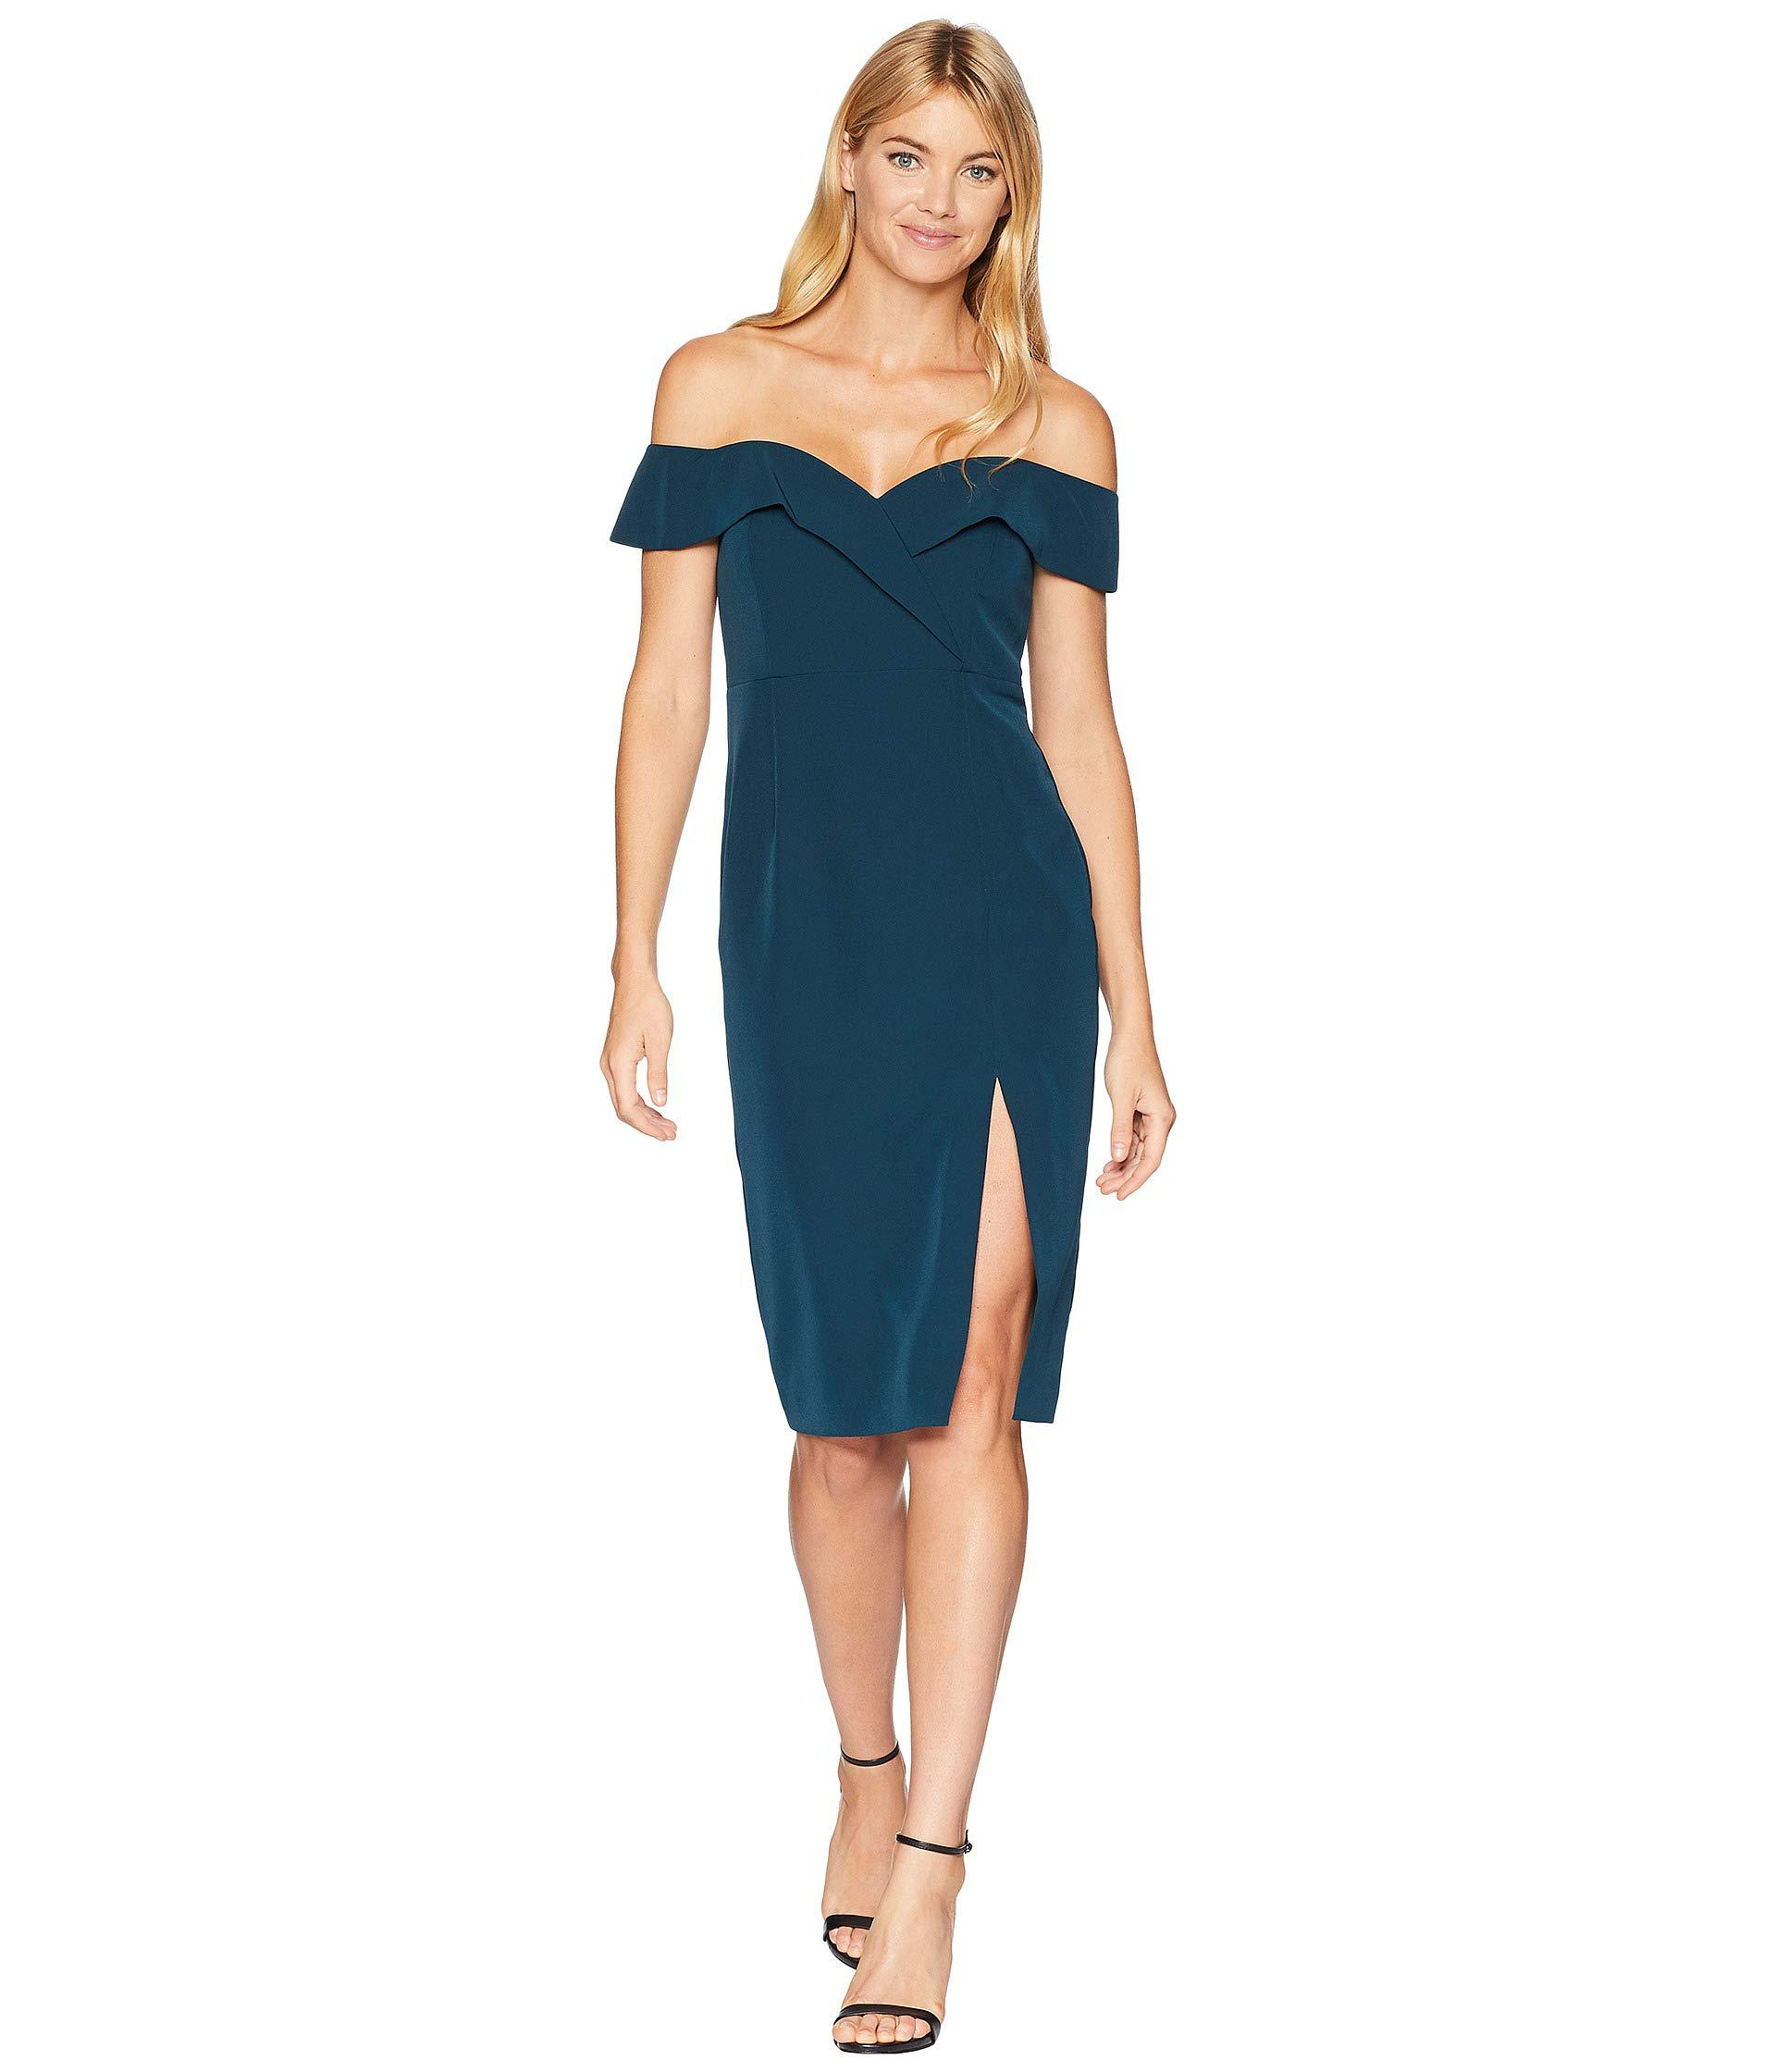 cc90ec9472d Bardot Bella Dress in Blue - Lyst